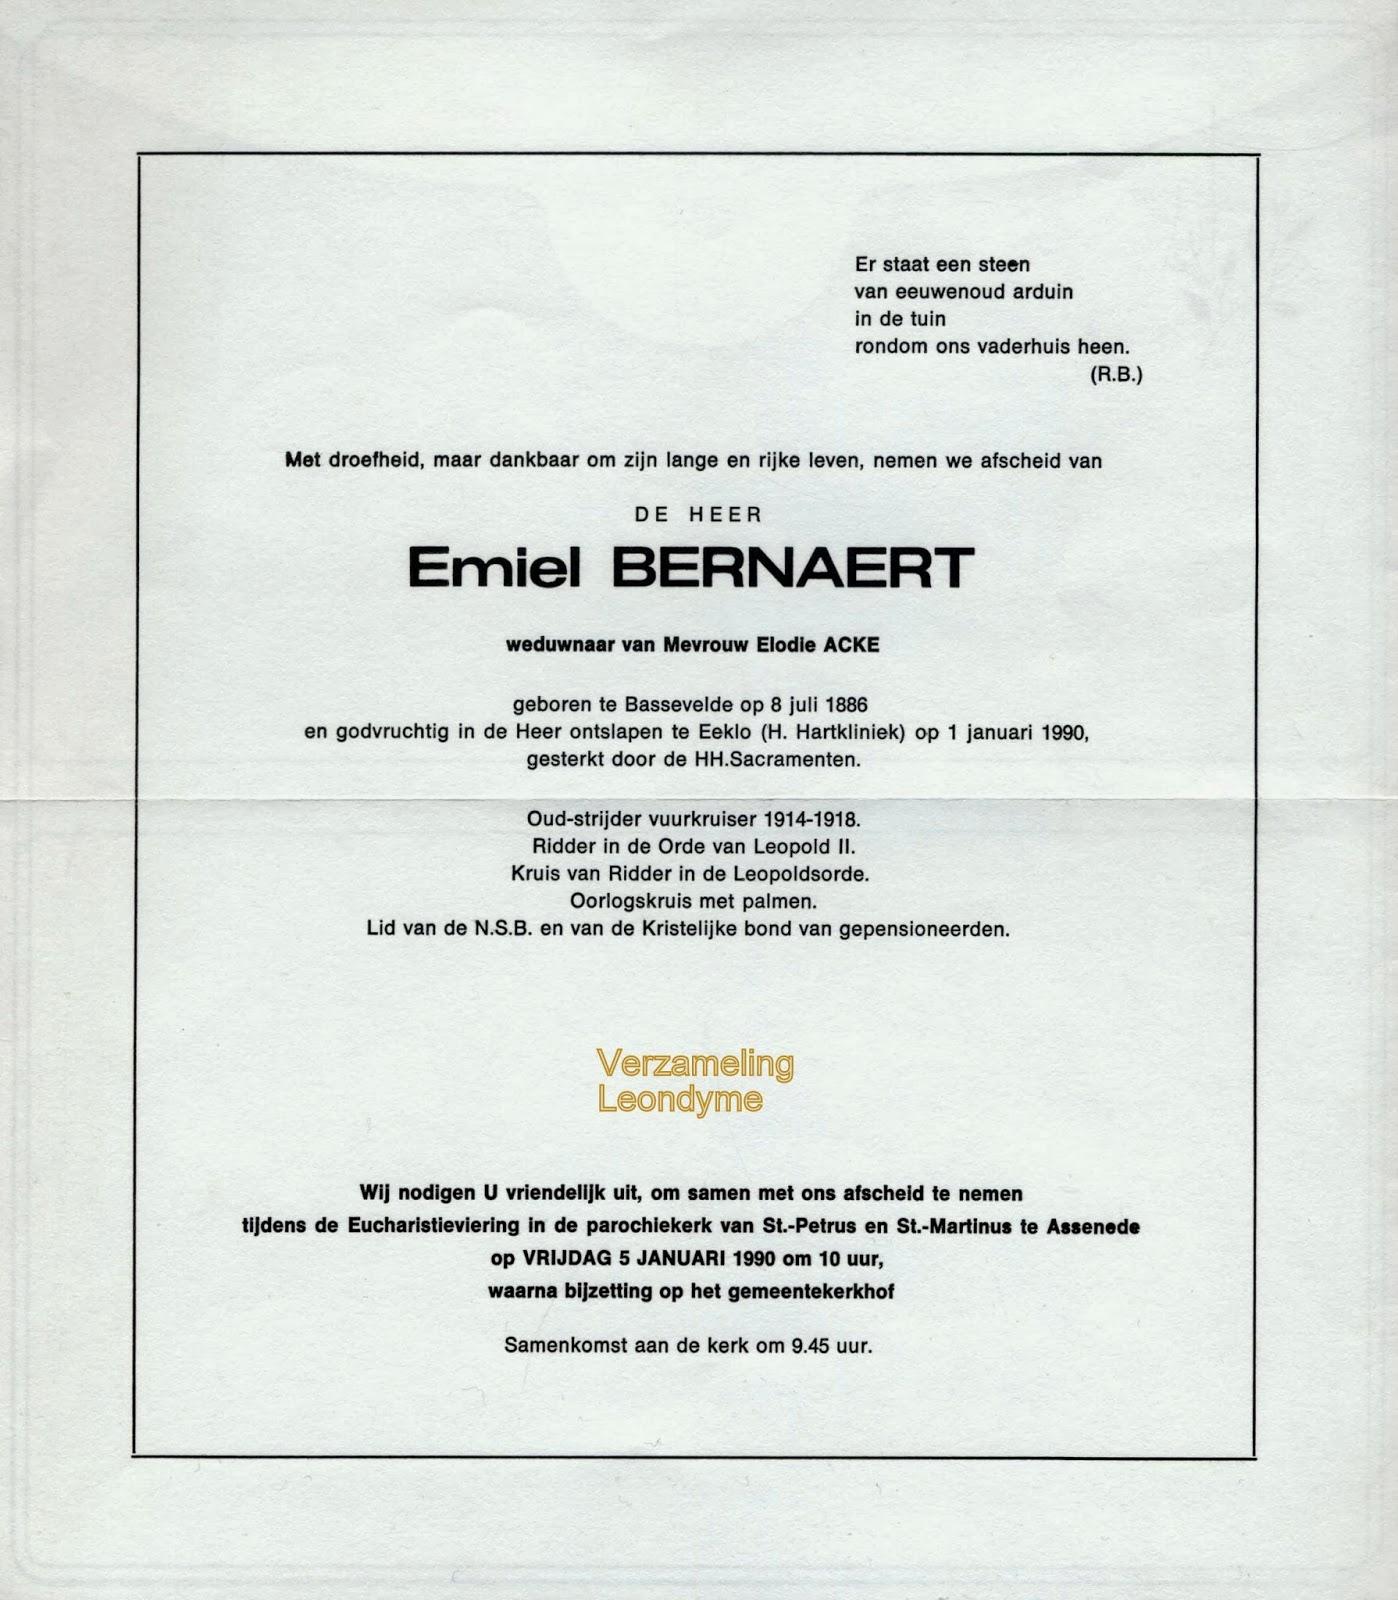 Rouwbrief, Emiel Bernaert 1886-1990. Verzameling Leondyme